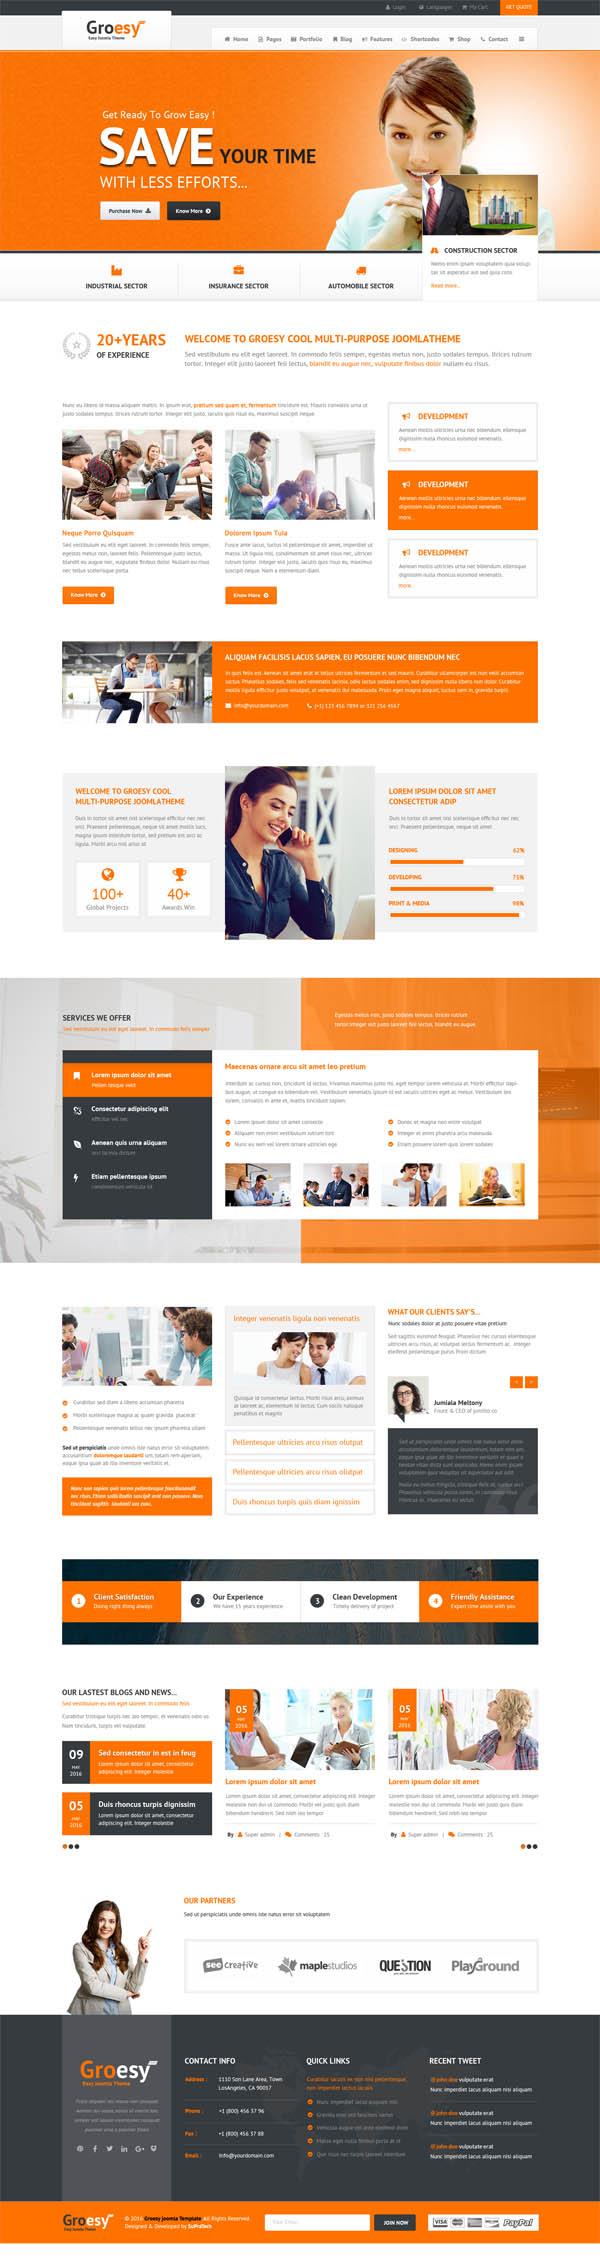 Groesy - Corporate Responsive Multi-Purpose WordPress Theme